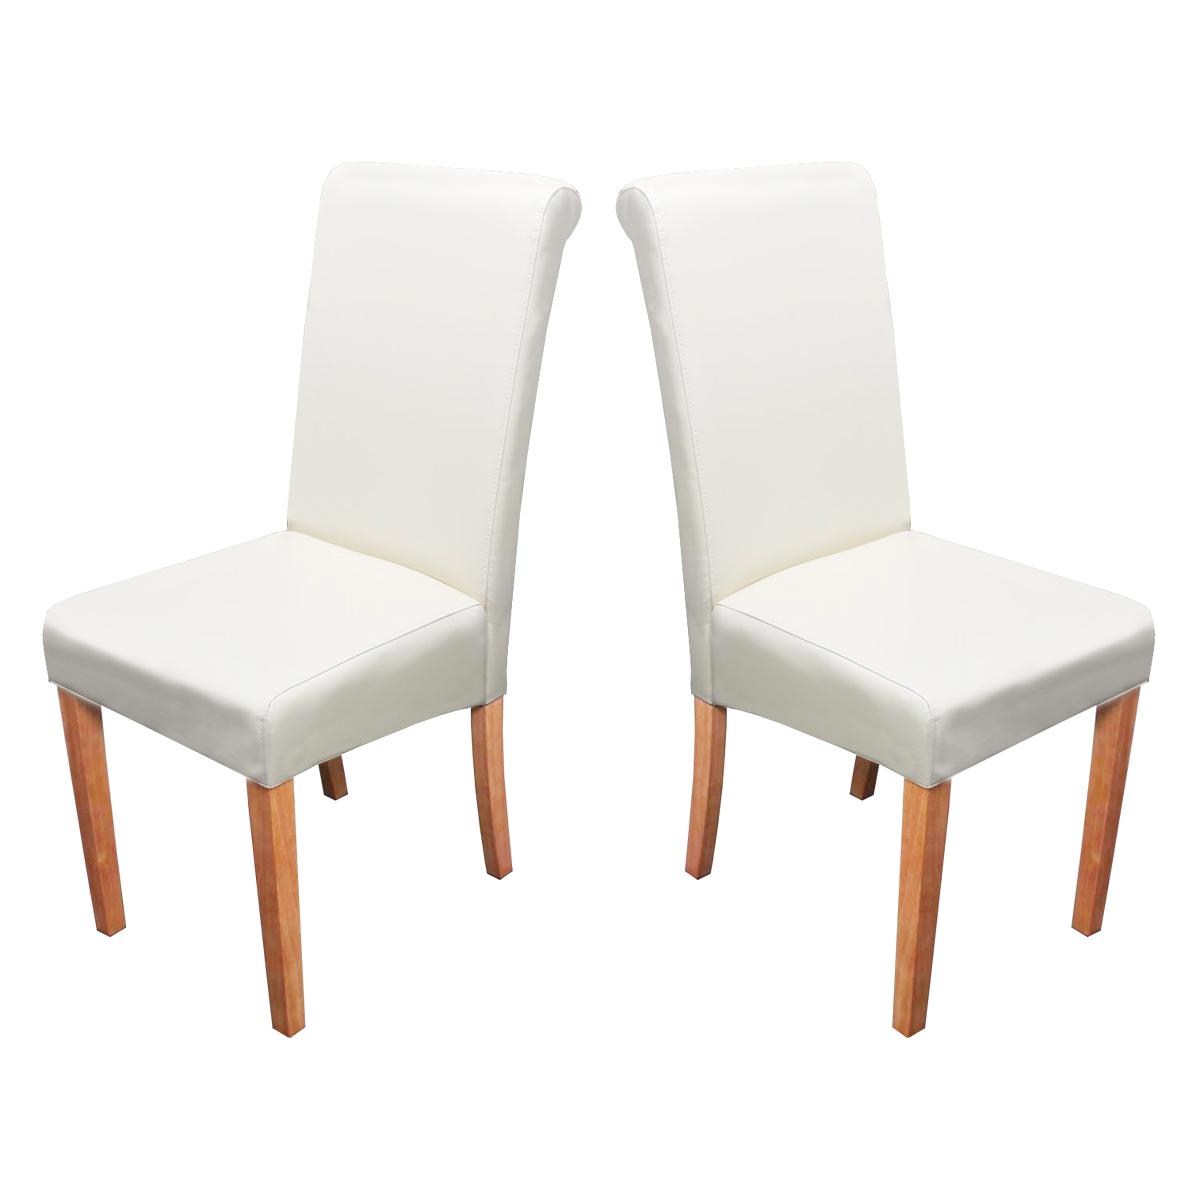 St hle weiss leder for Dunord design stuhl verona